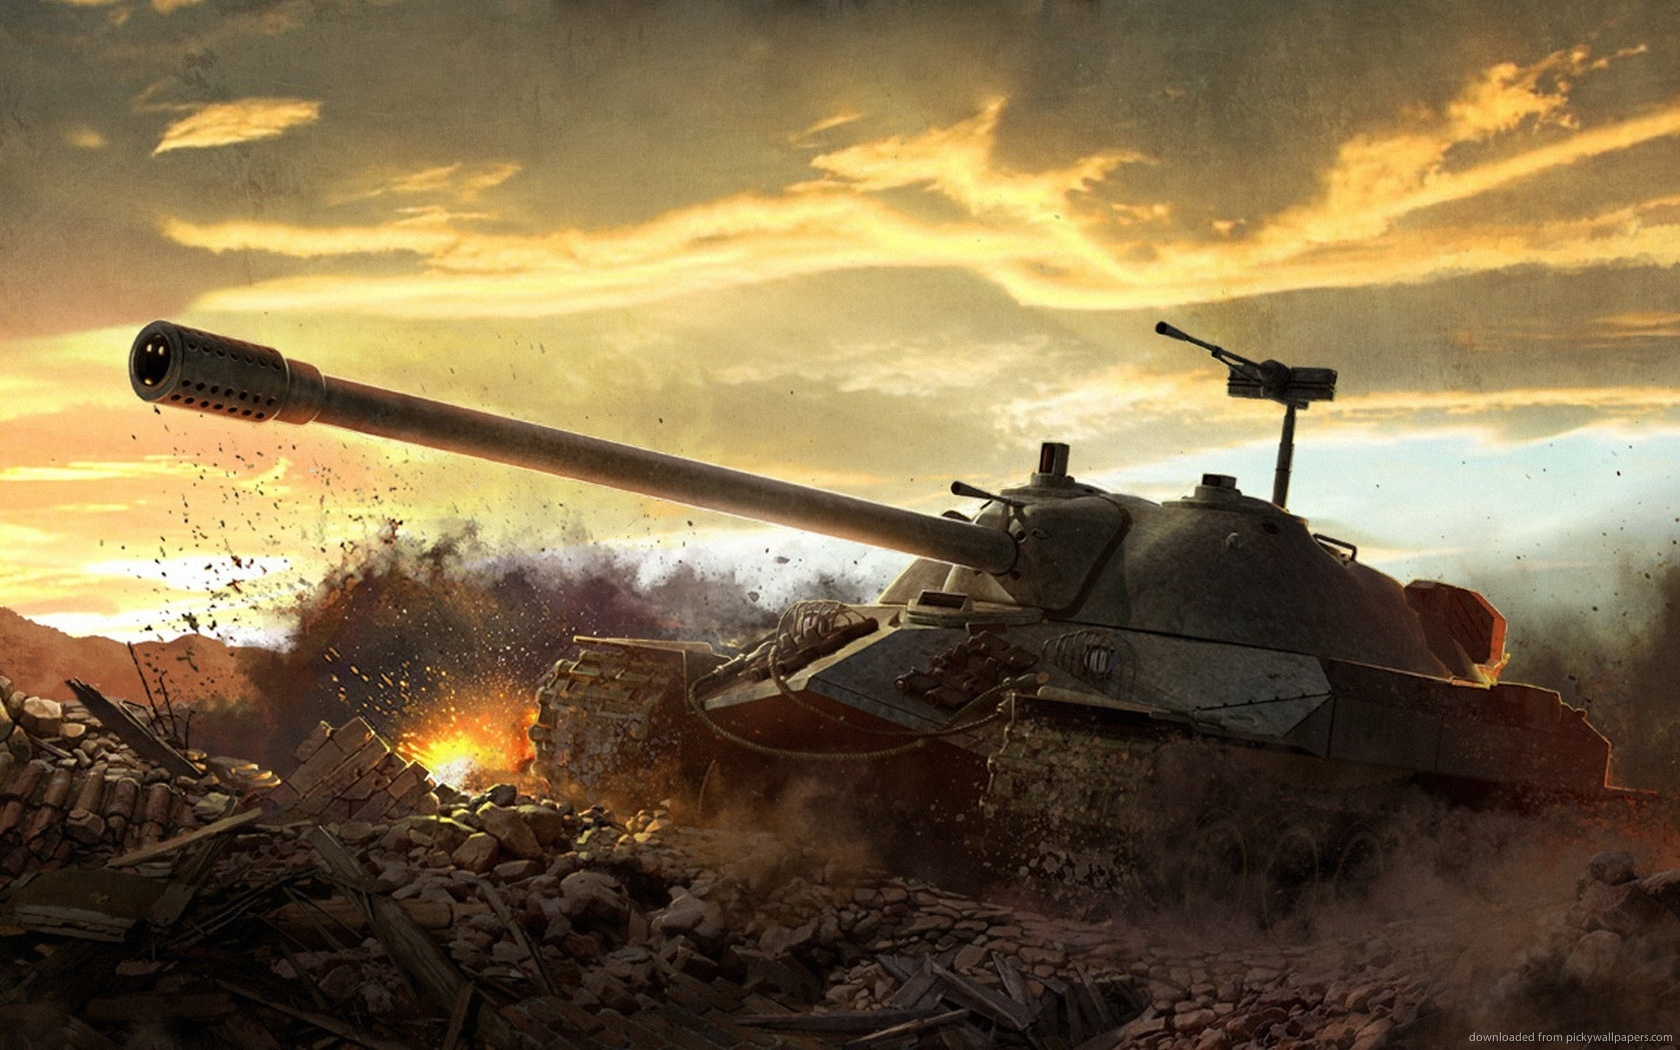 43 World Of Tanks Wallpaper 1680x1050 On Wallpapersafari